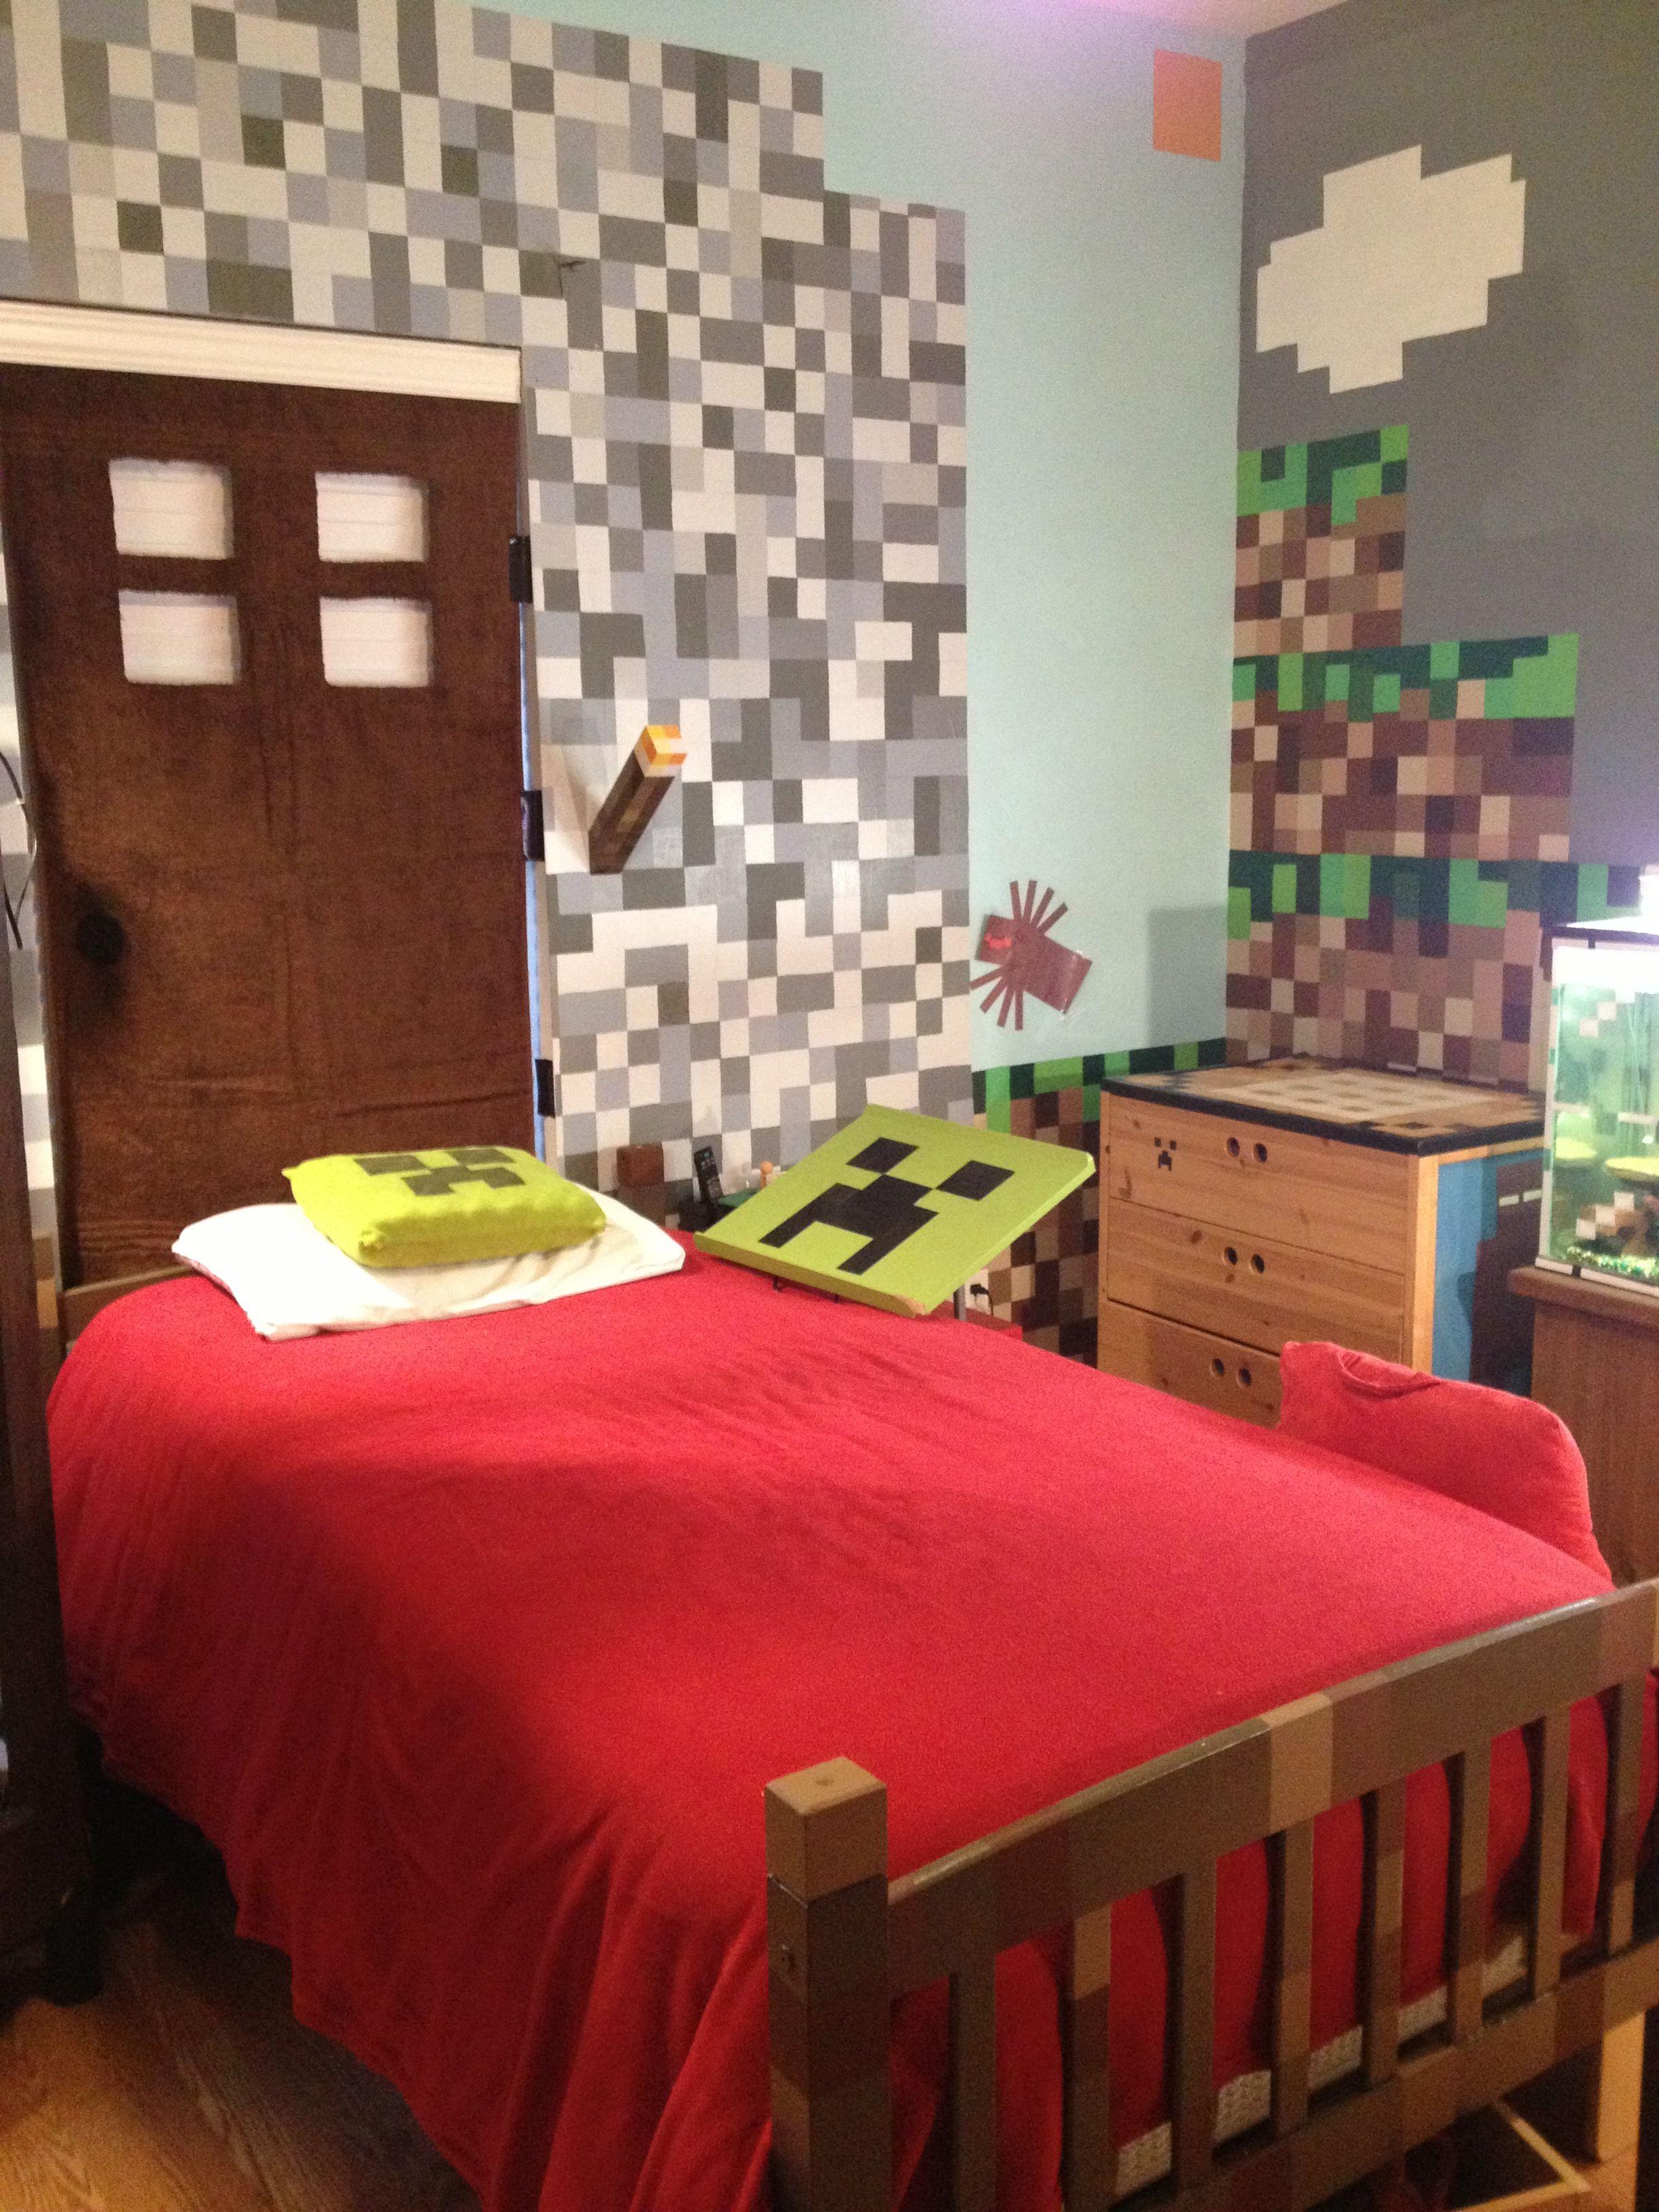 Minecraft Room With Images Minecraft Room Minecraft Bedroom